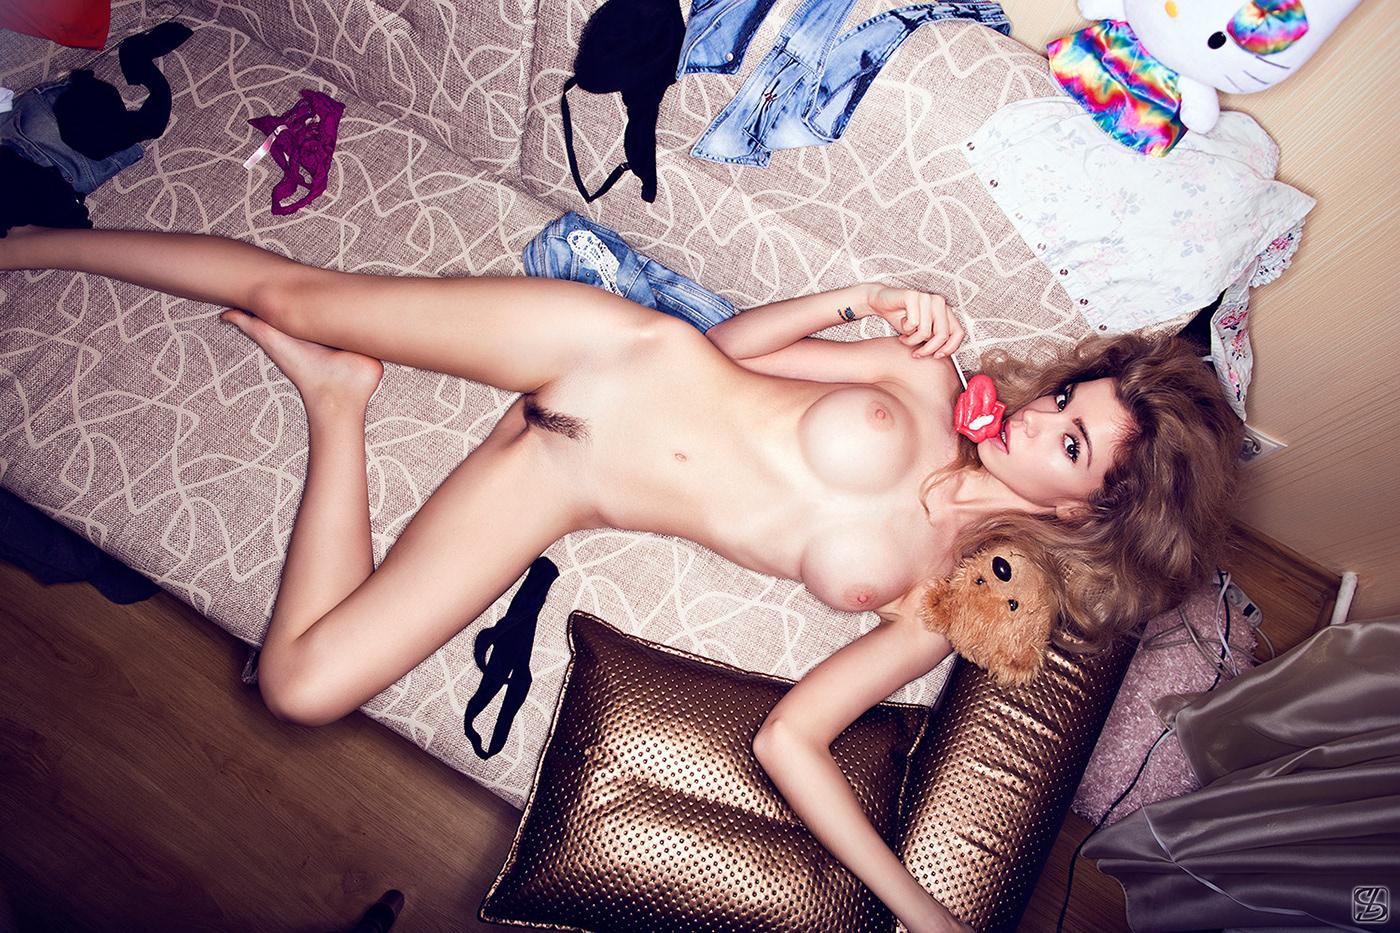 nude photo / фото Slinky ADVphoto